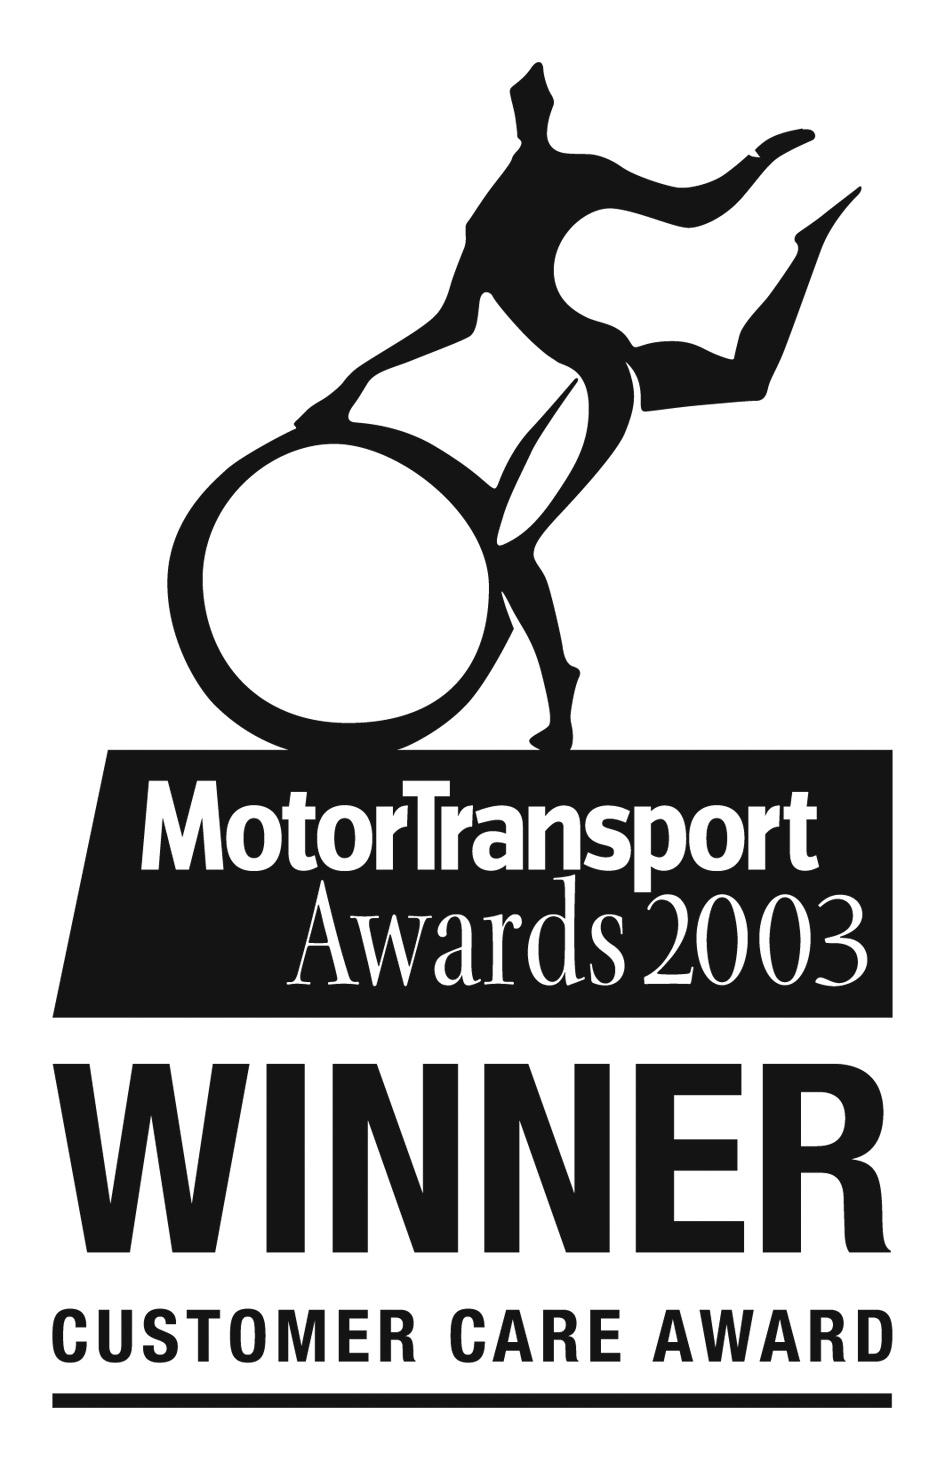 MT_win_awards_customer_care_03.jpg